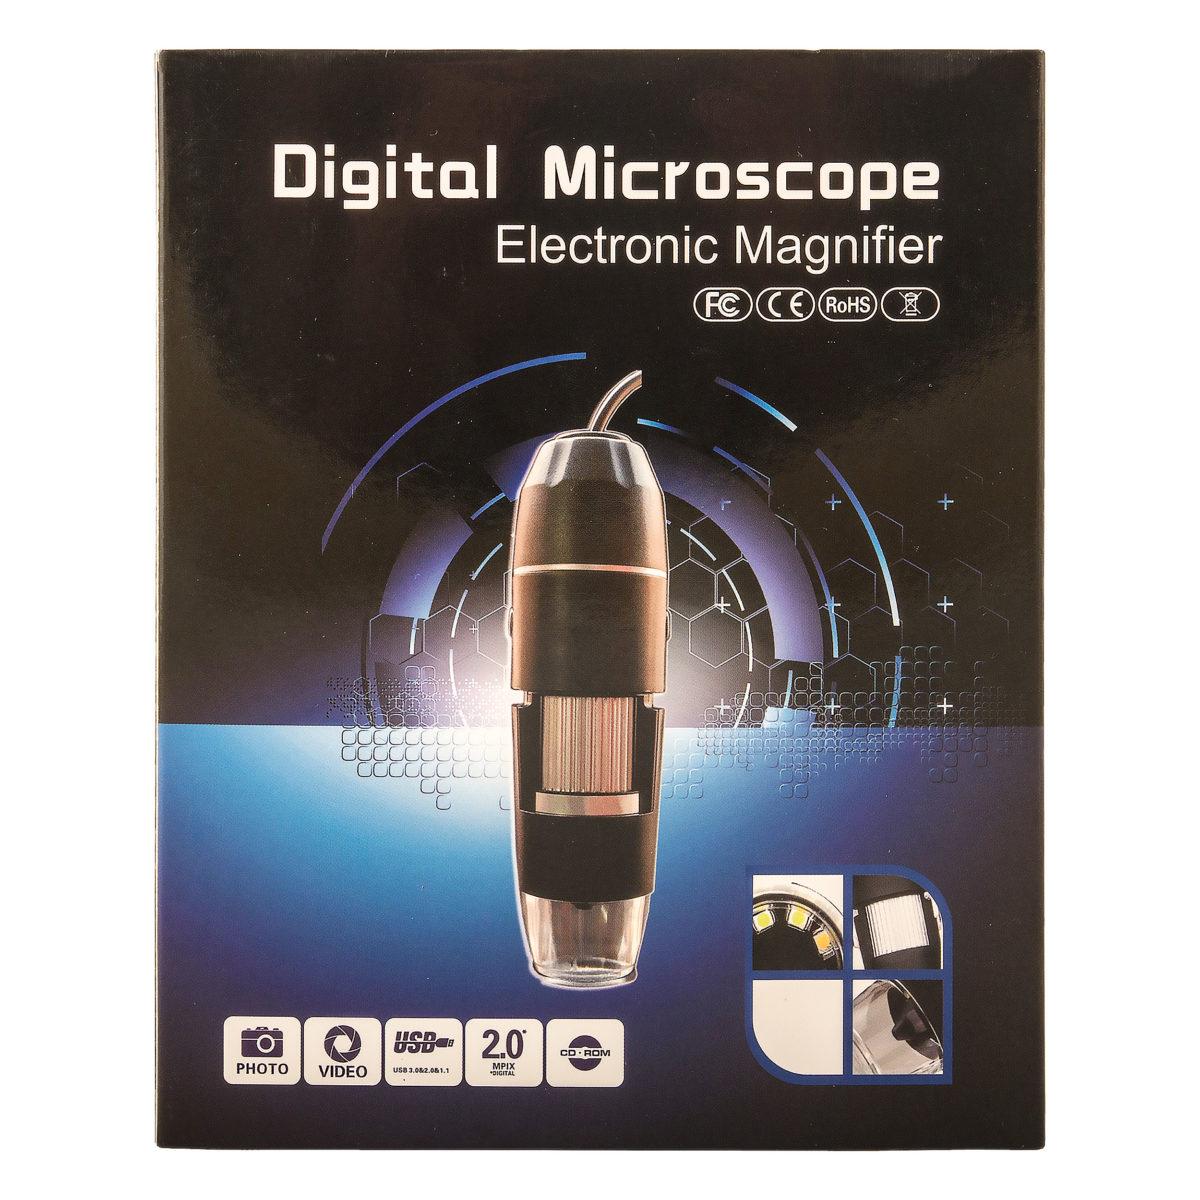 Digital Microscope Electronic Magnifier Цифровой микроскоп оптом